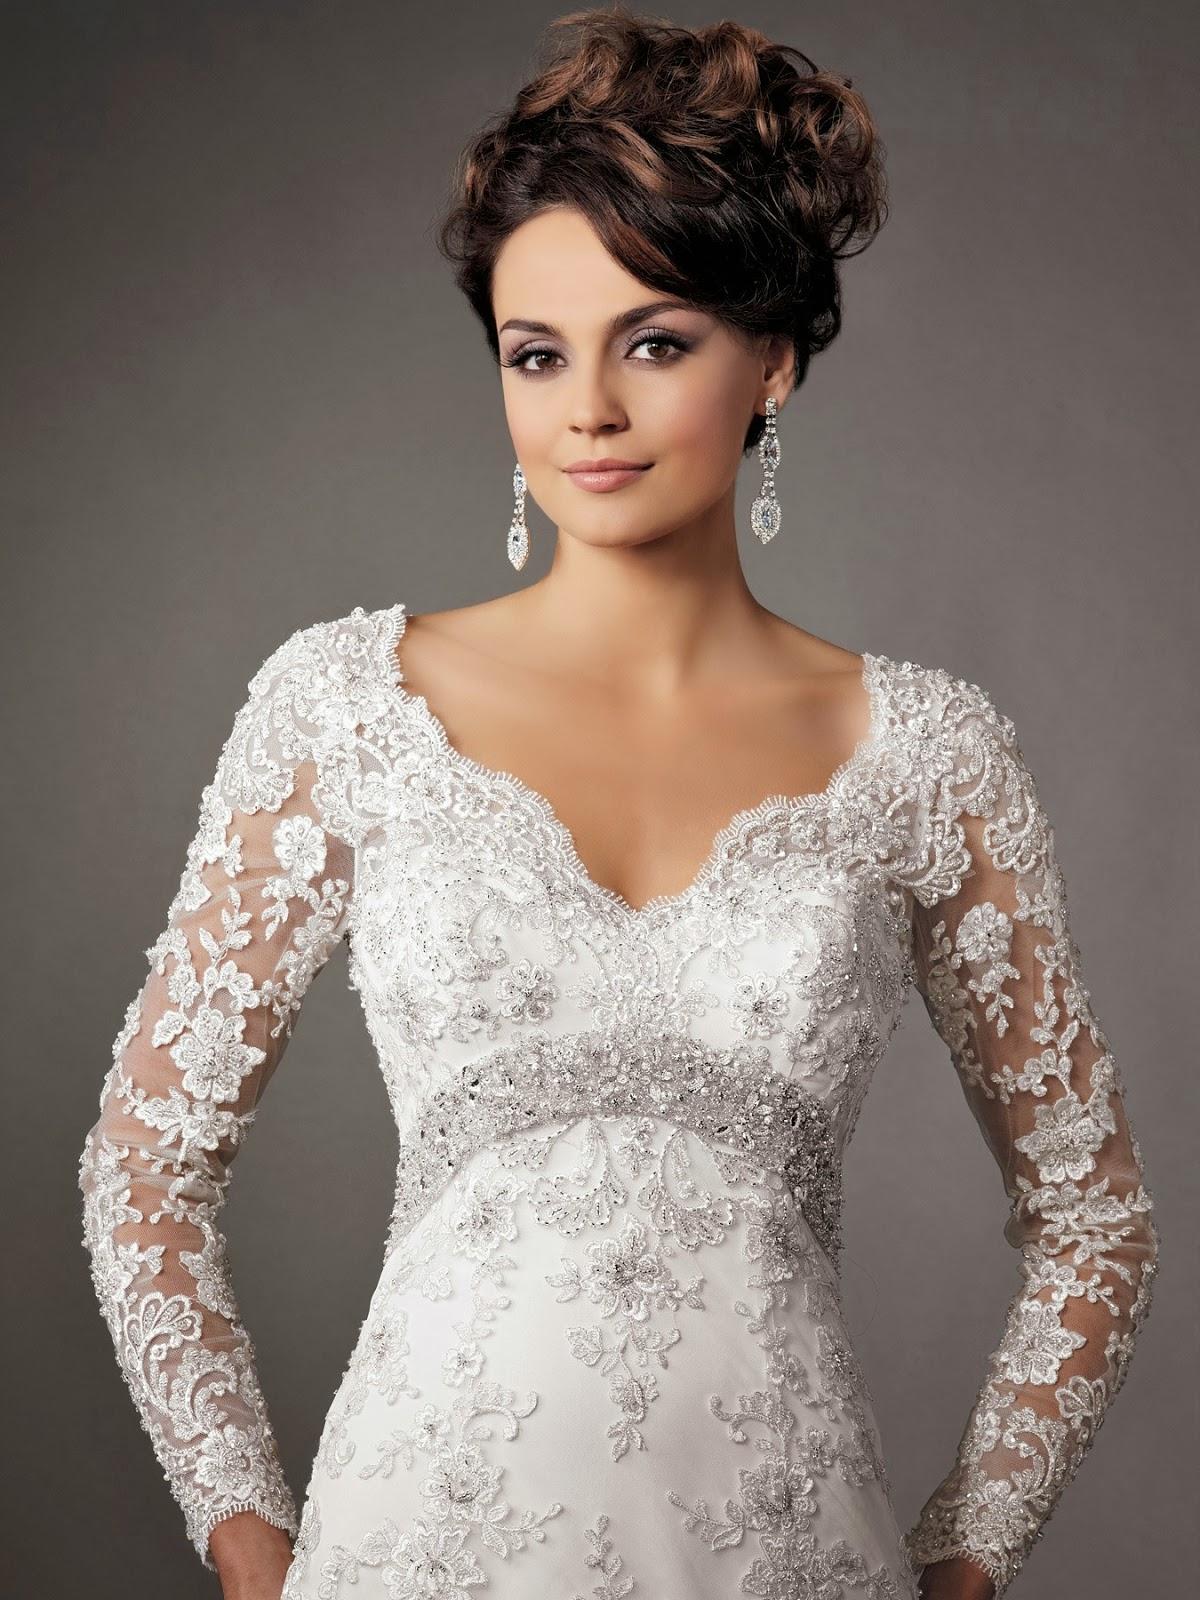 Tipo de vestido? - Foro Moda Nupcial - bodas.com.mx